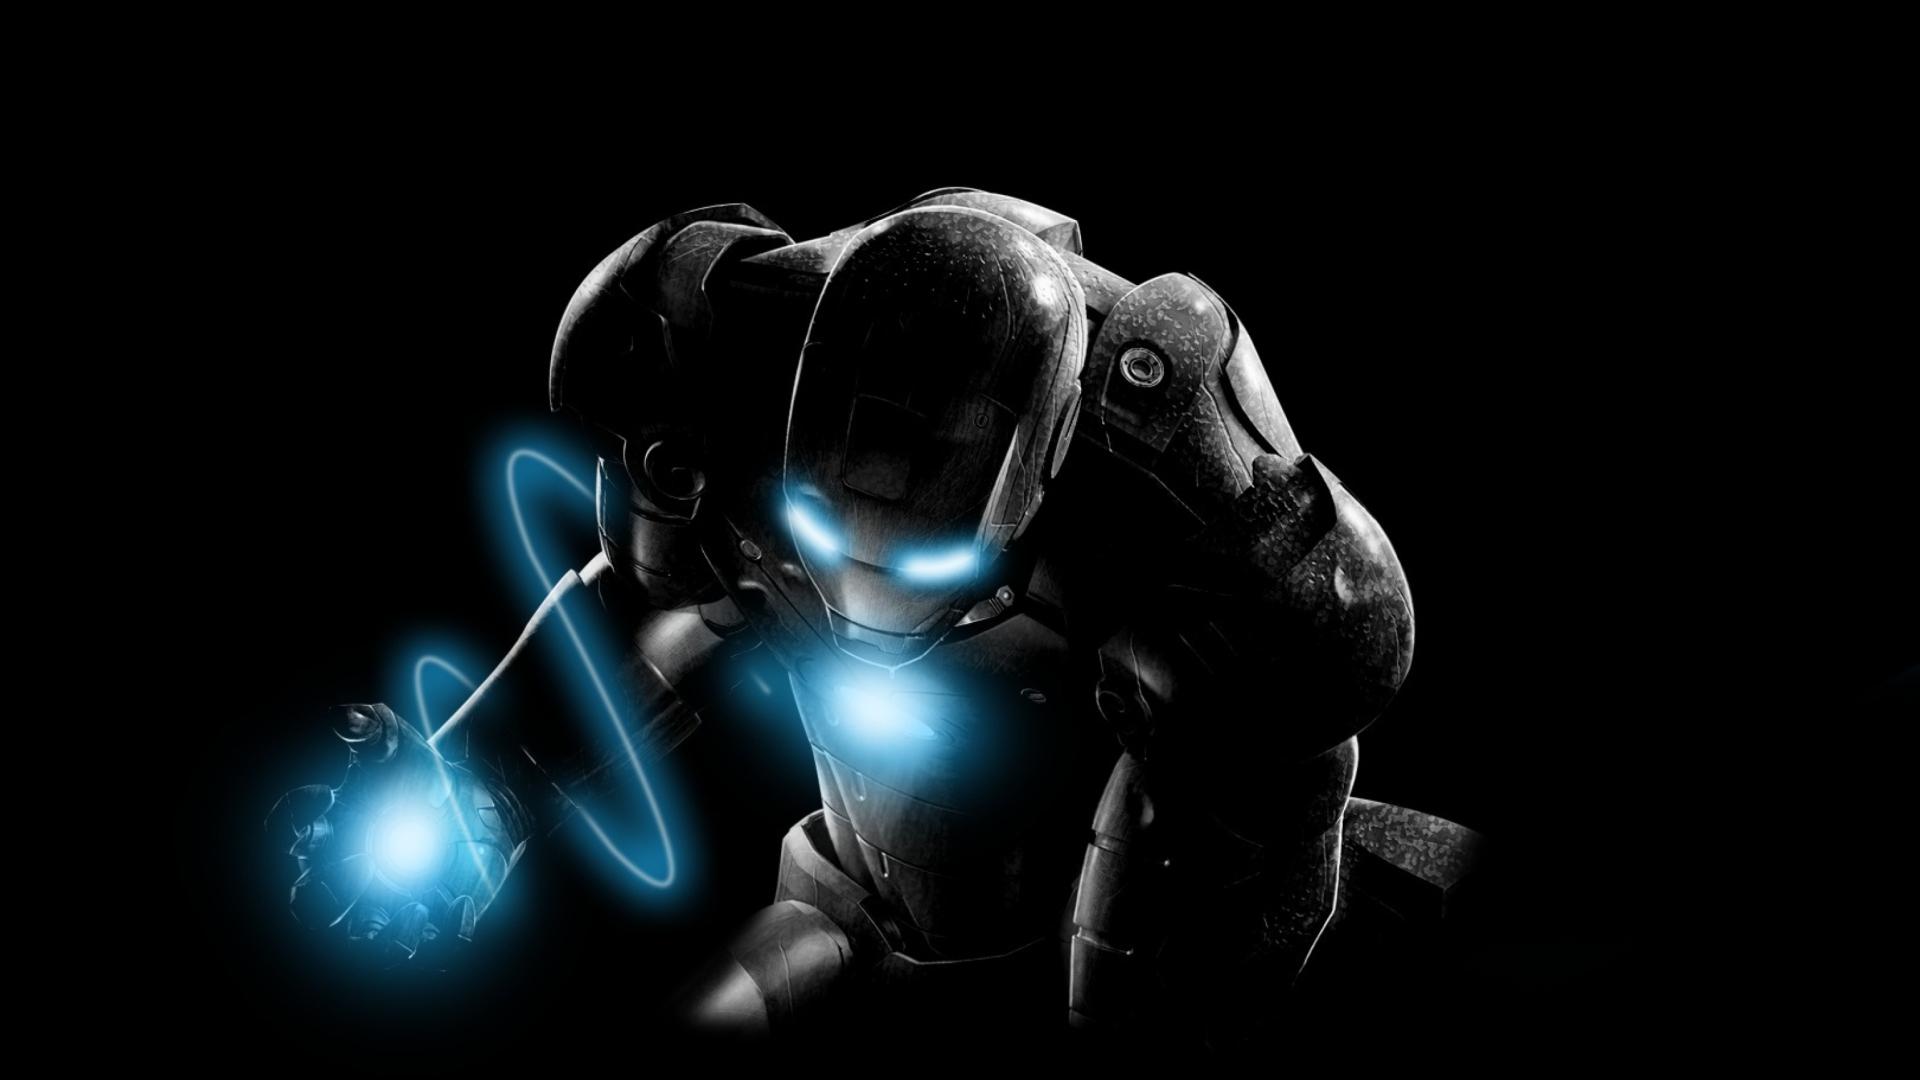 Mysterious iron man sfondi gratuiti per desktop 1920x1080 for Sfondi iron man